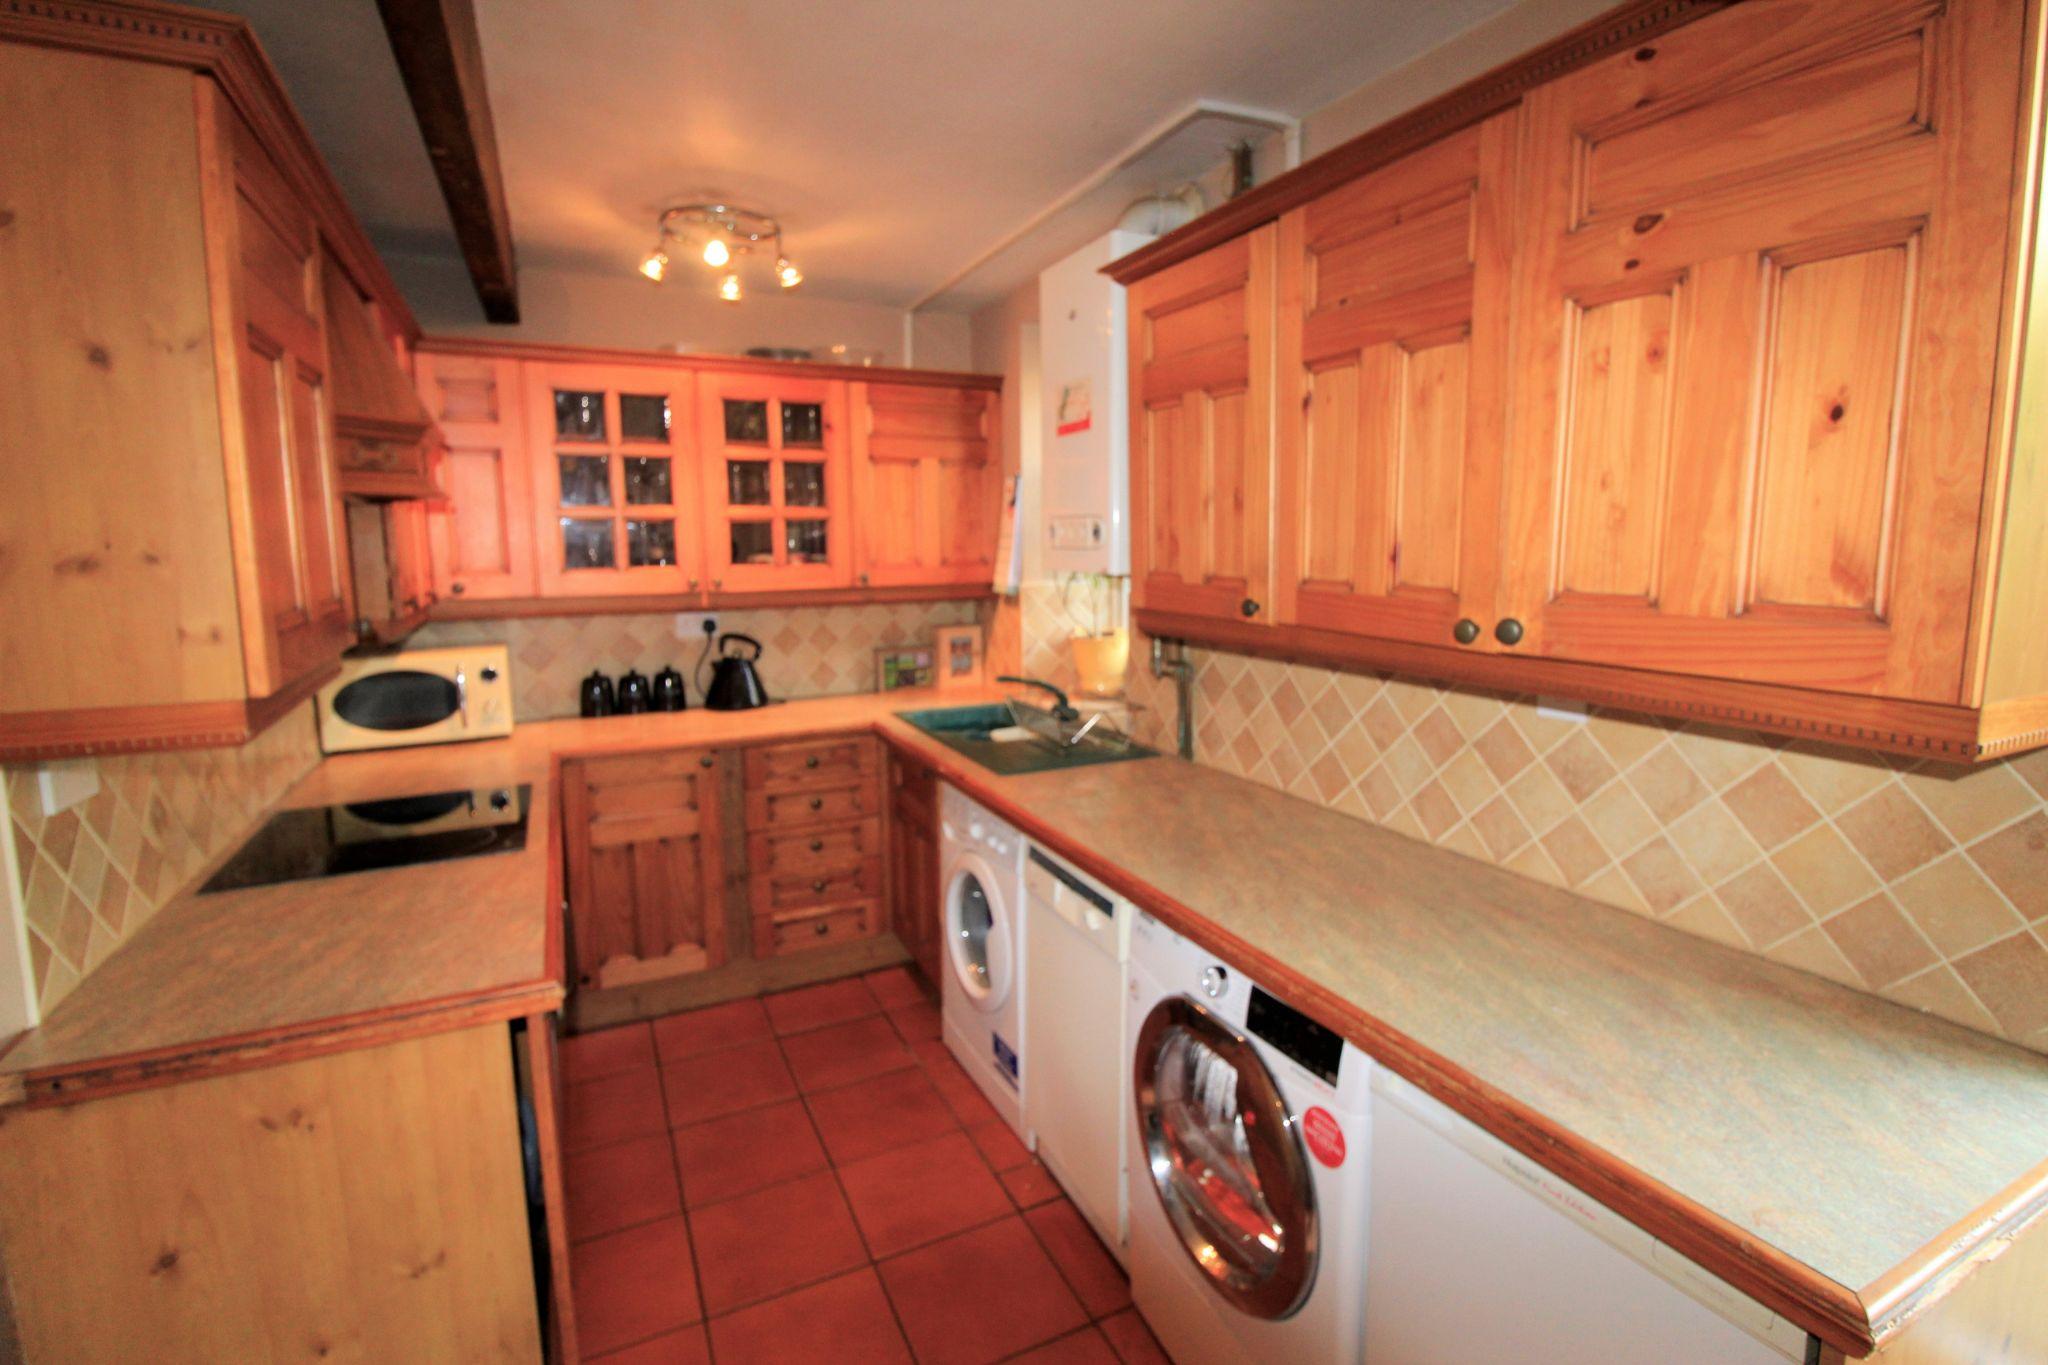 3 bedroom mid terraced house SSTC in Bradford - Kitchen